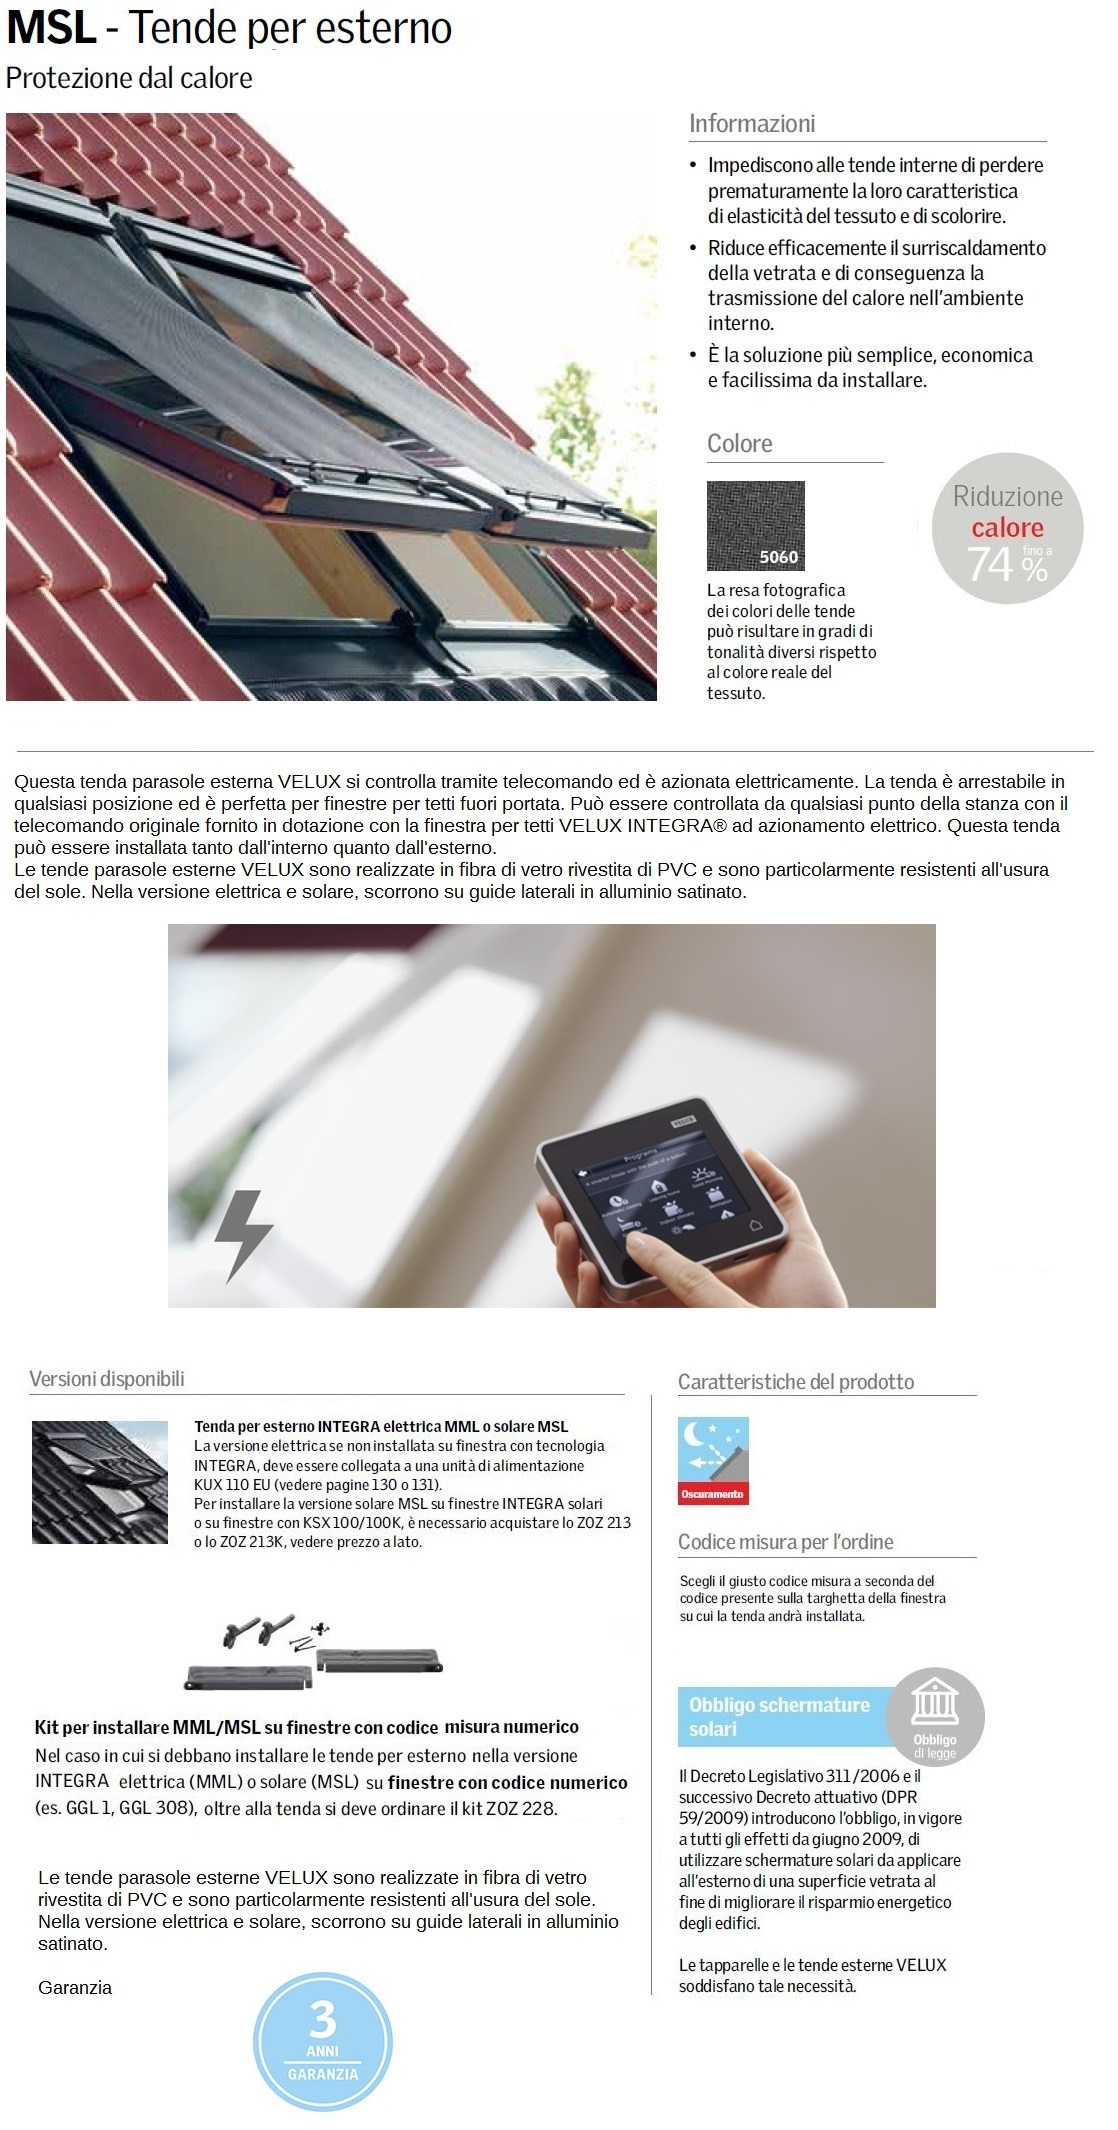 Tenda per esterno velux msl 5060 integra solare maffei for Infissi velux prezzi